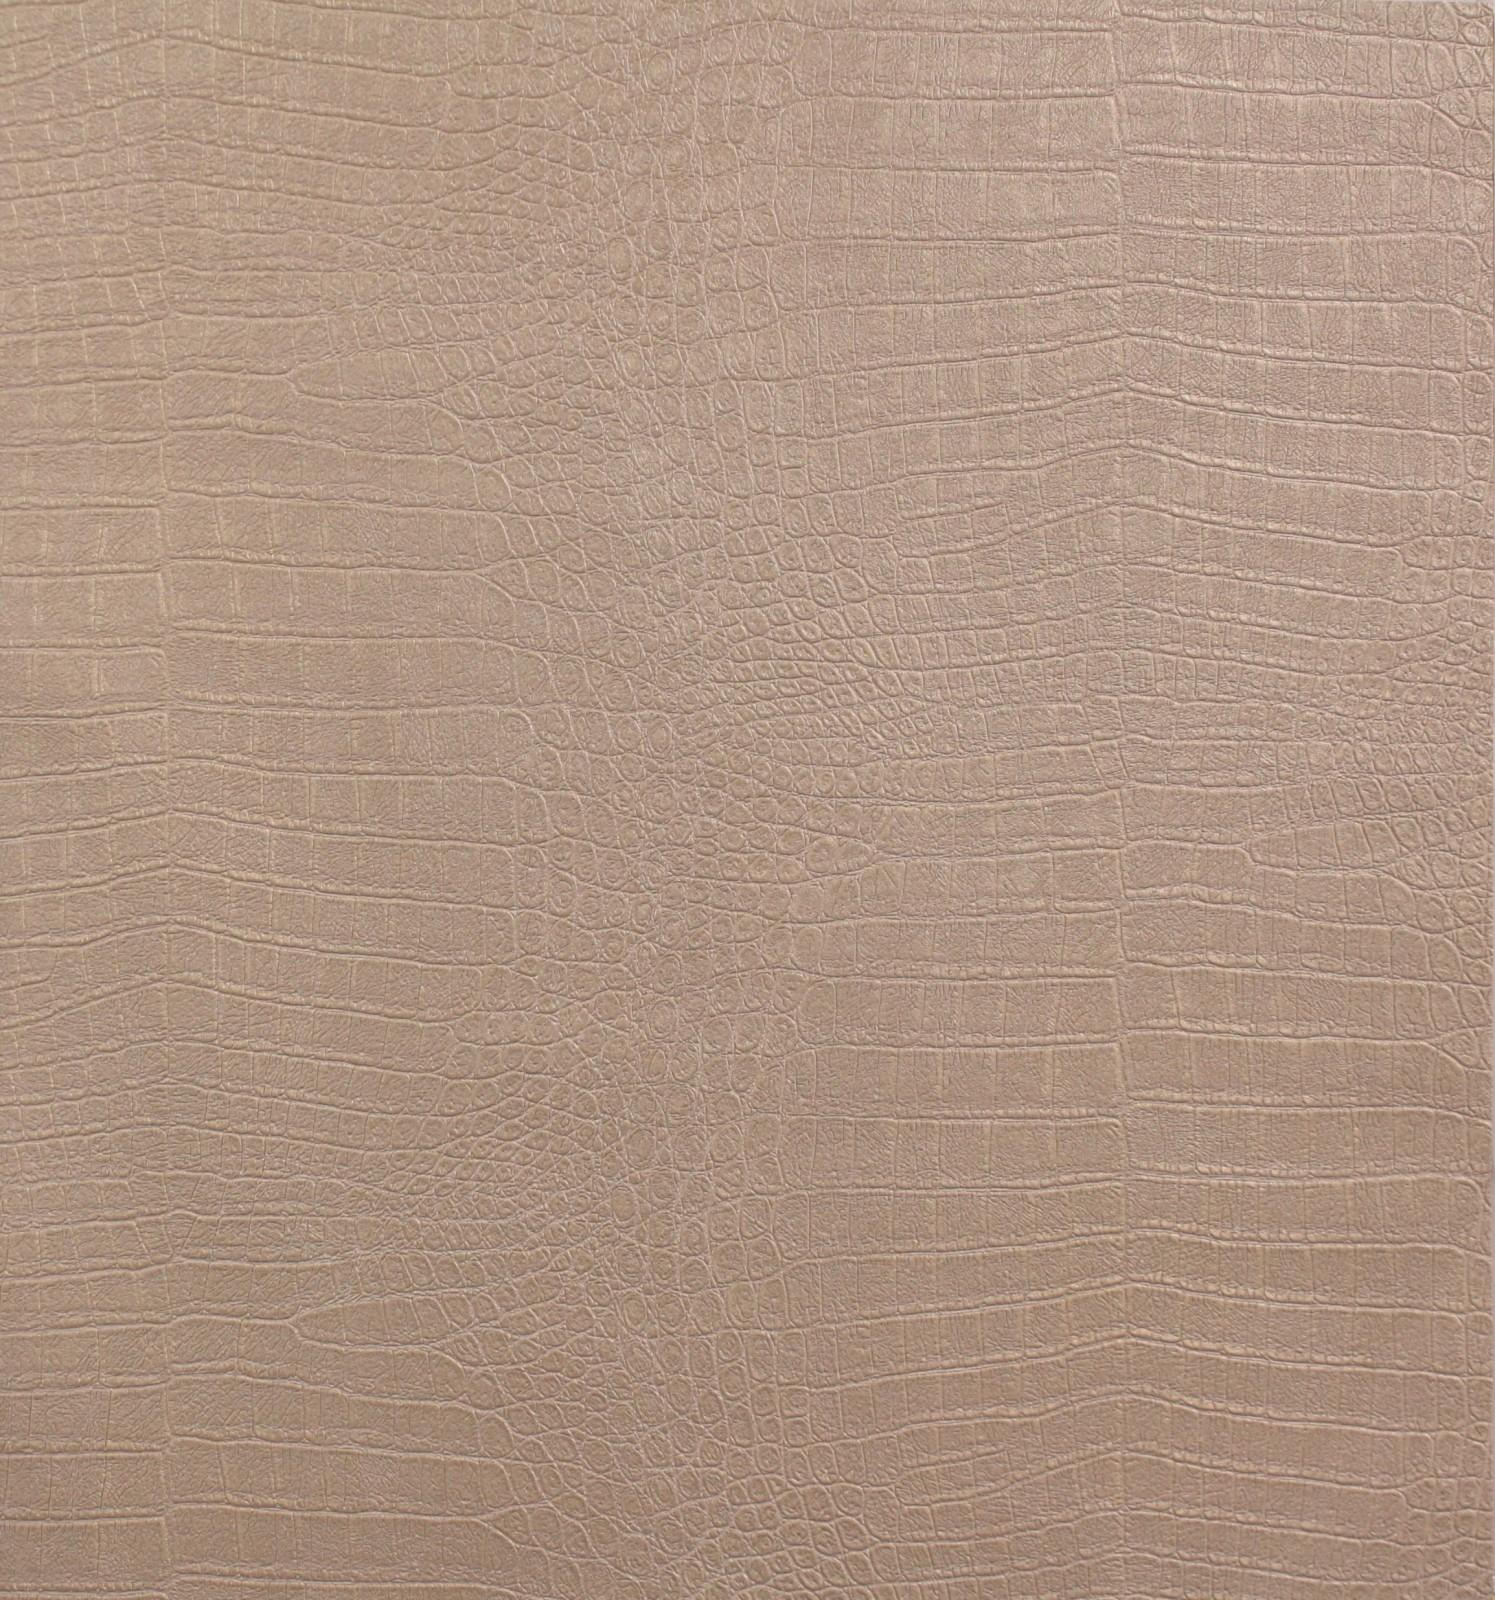 safari tapete out of africa vliestapete715491 krokodil beige braun ebay. Black Bedroom Furniture Sets. Home Design Ideas